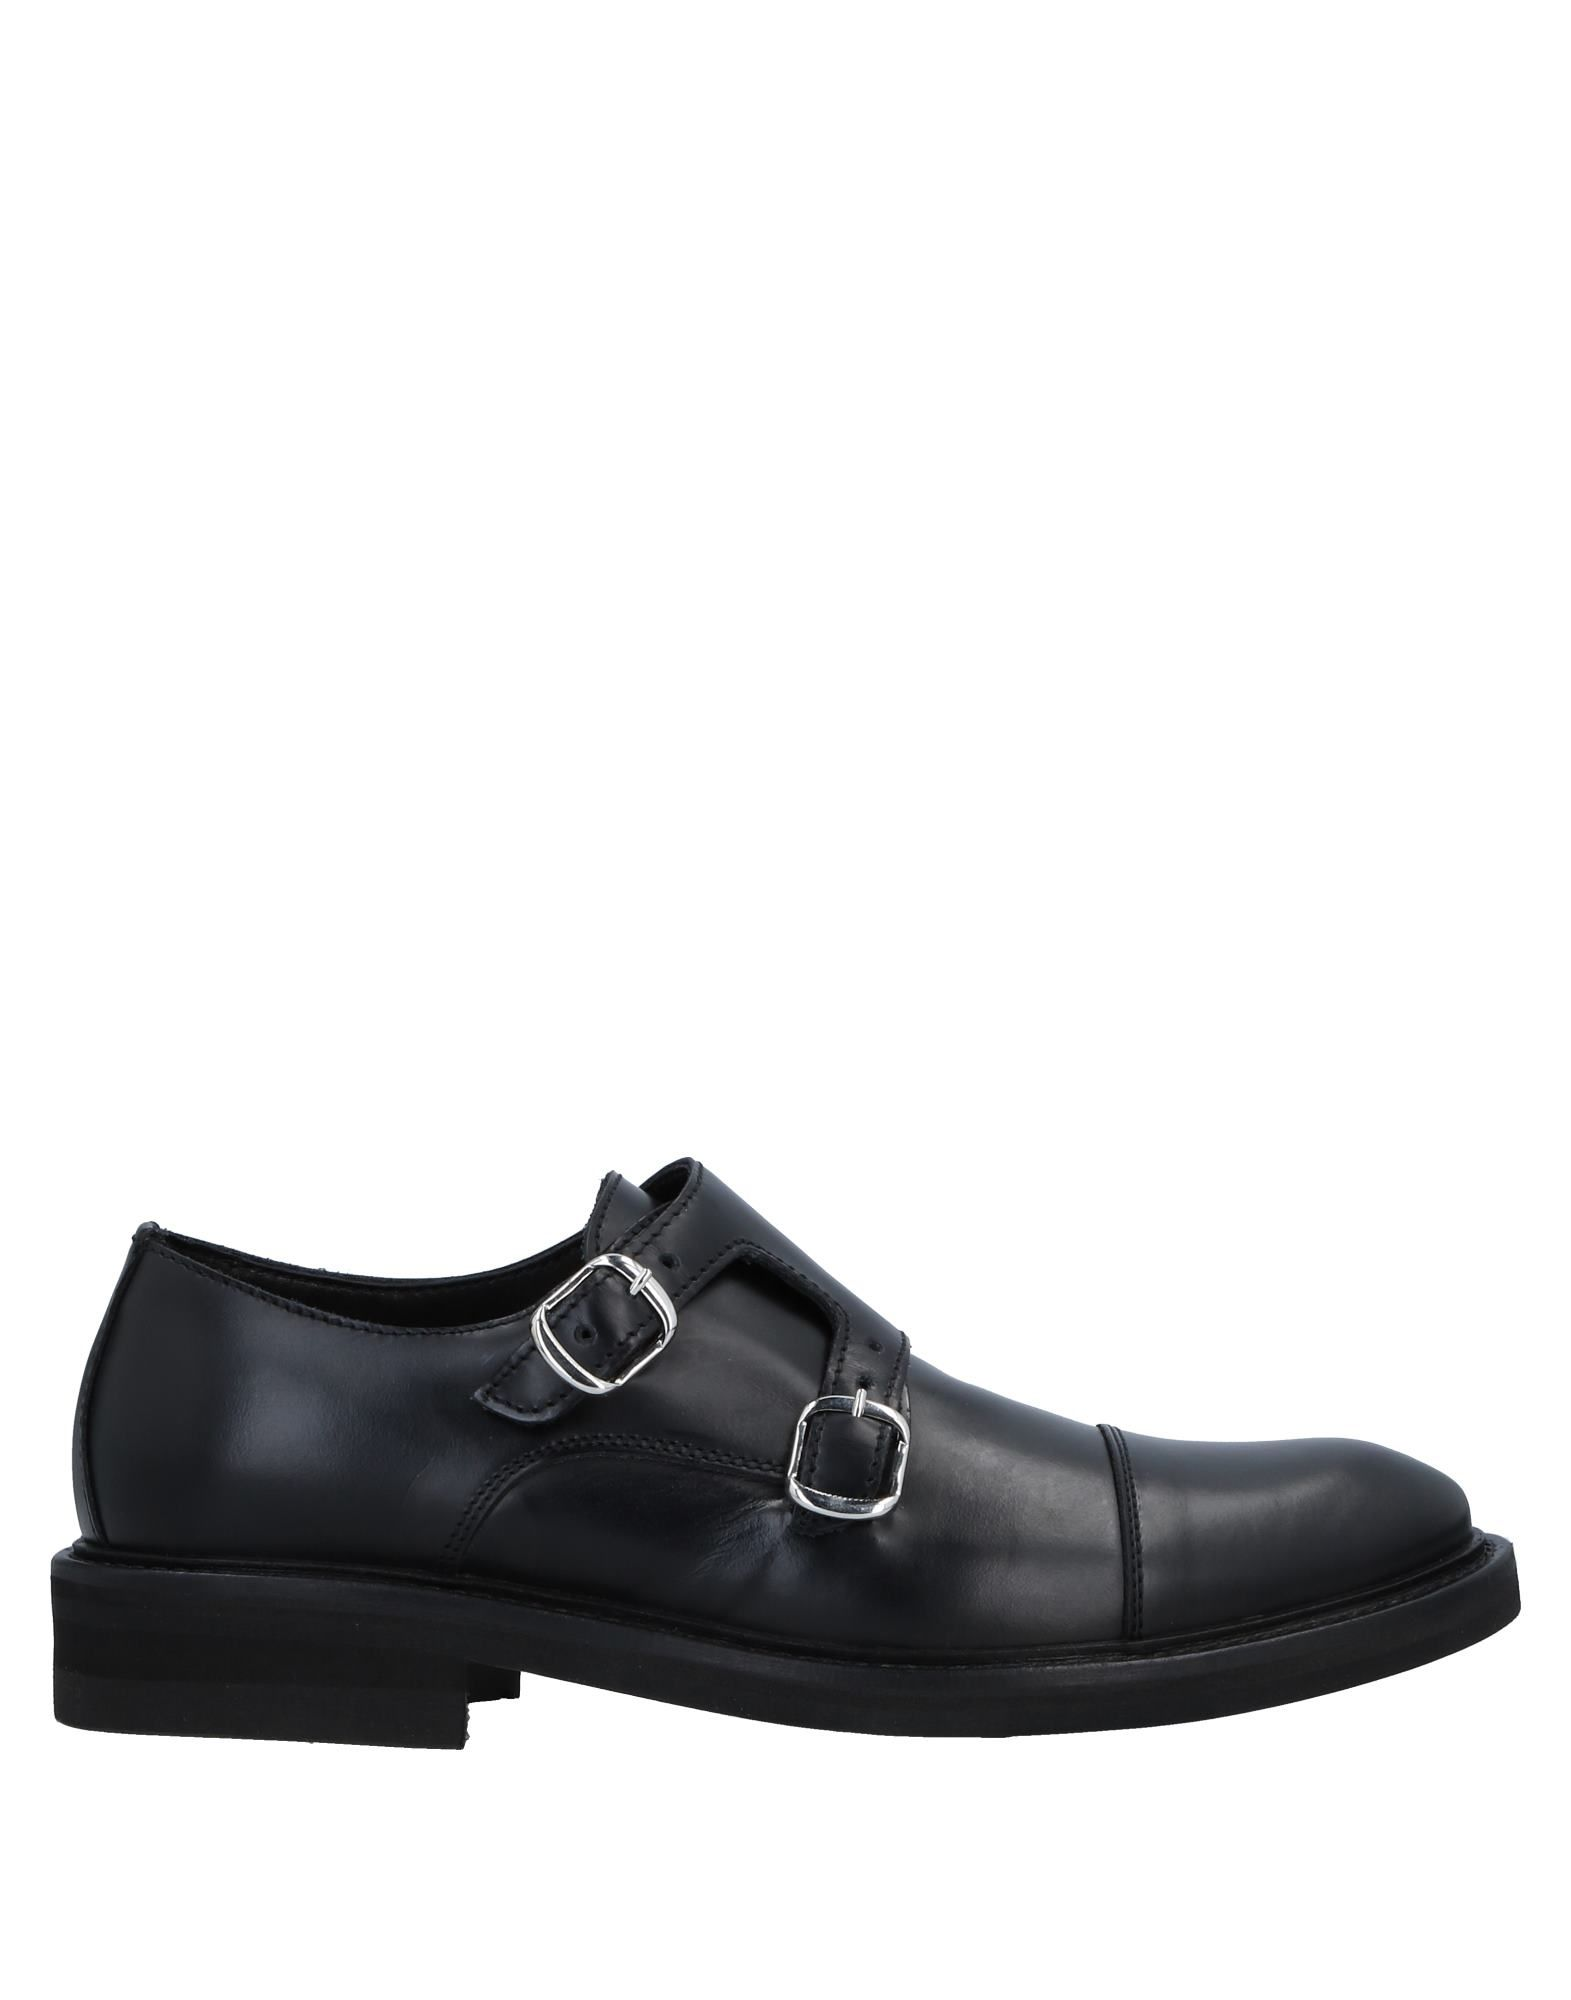 SEBOYS Loafers in Black